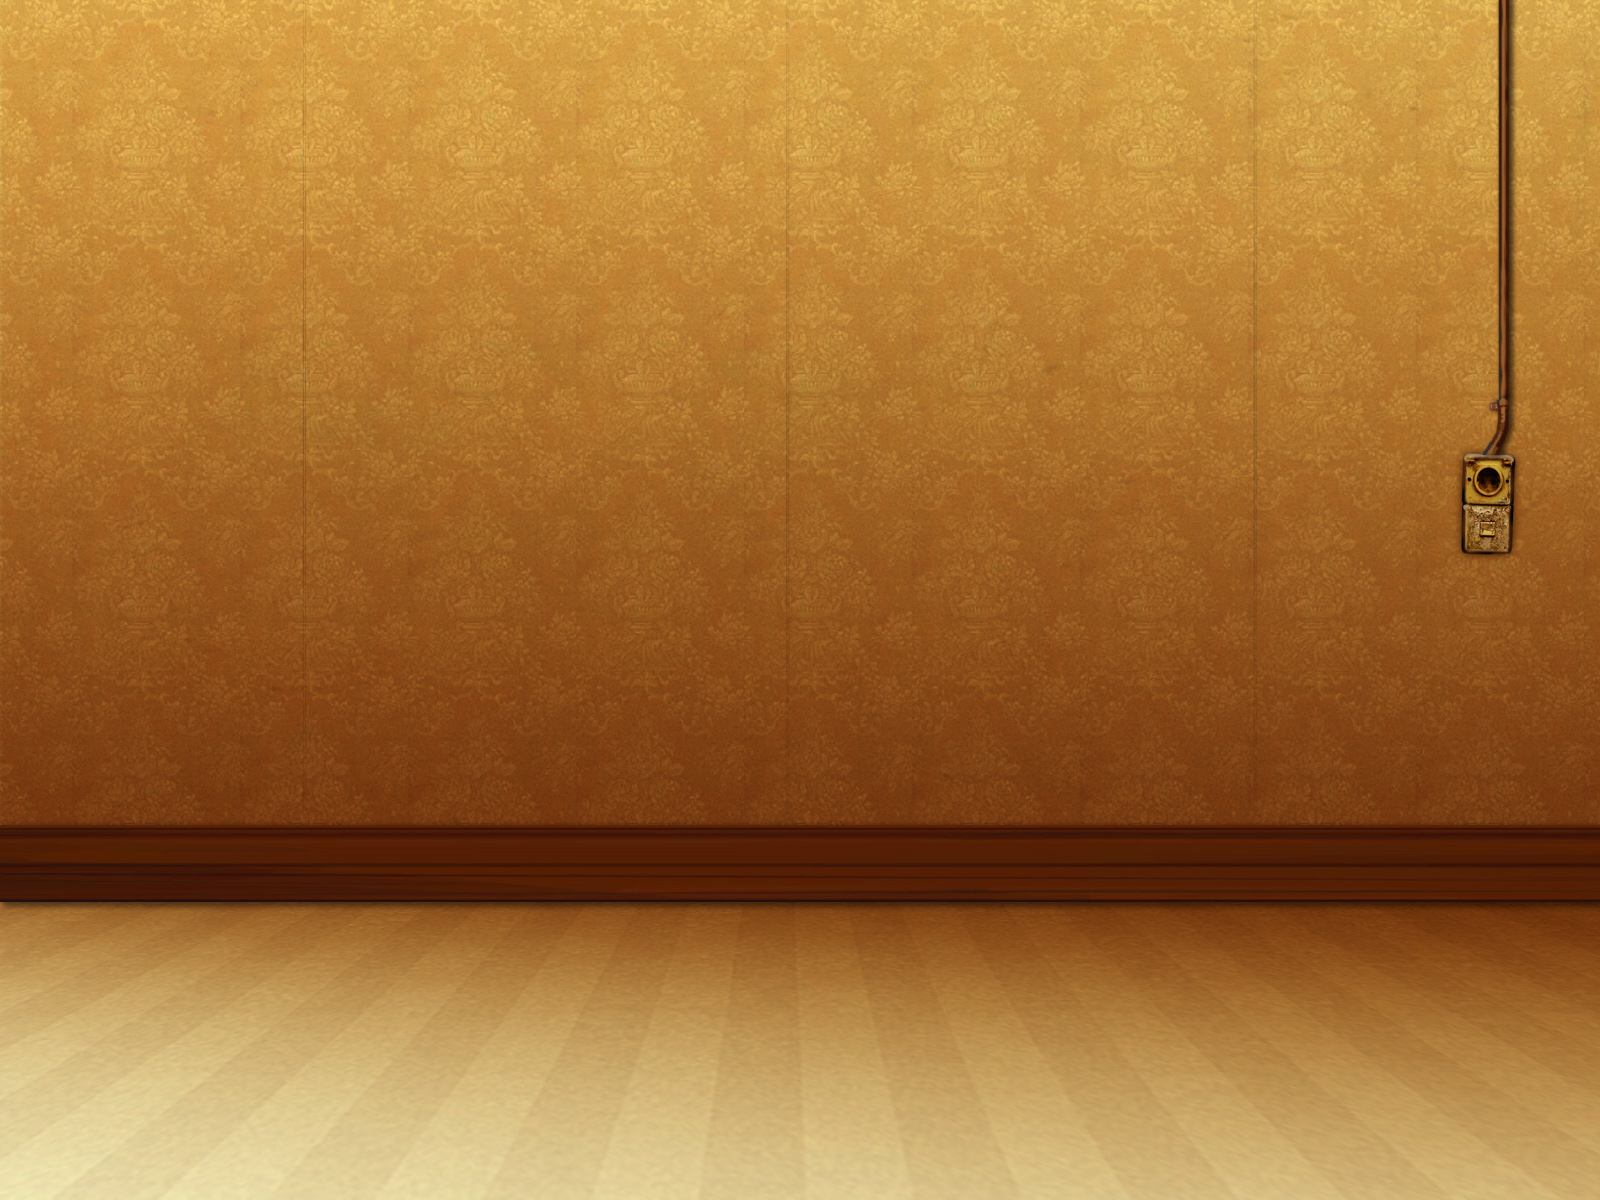 empty room wallpaper 1710x1226 - photo #13